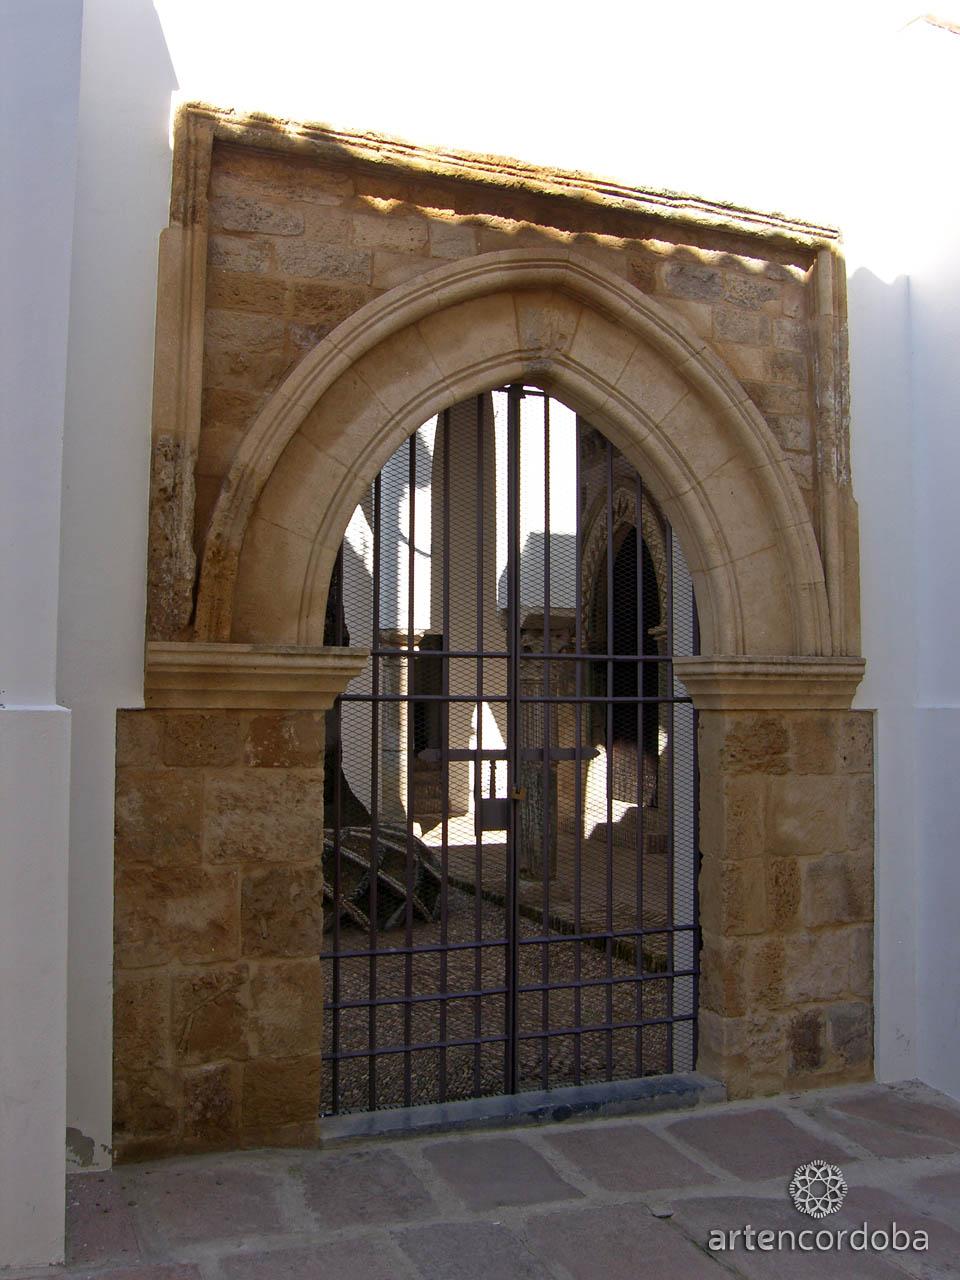 Acceso que conduce al patio de la Capilla Mudéjar de San Bartolomé en Córdoba